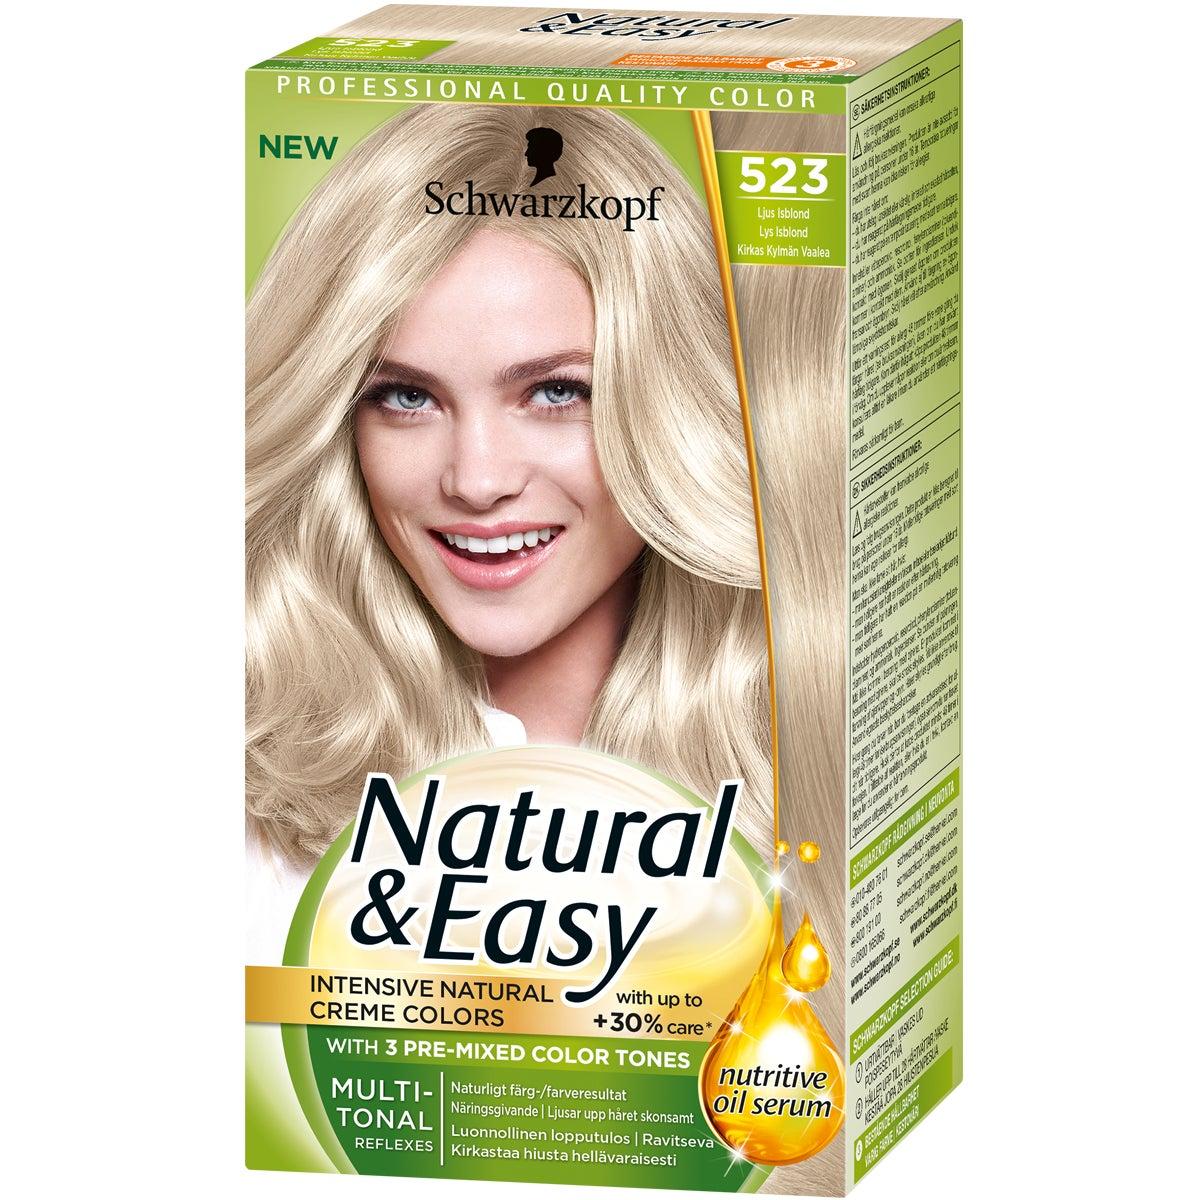 Natural & Easy 523 Ljus Isblond Schwarzkopf Blond hårfärg